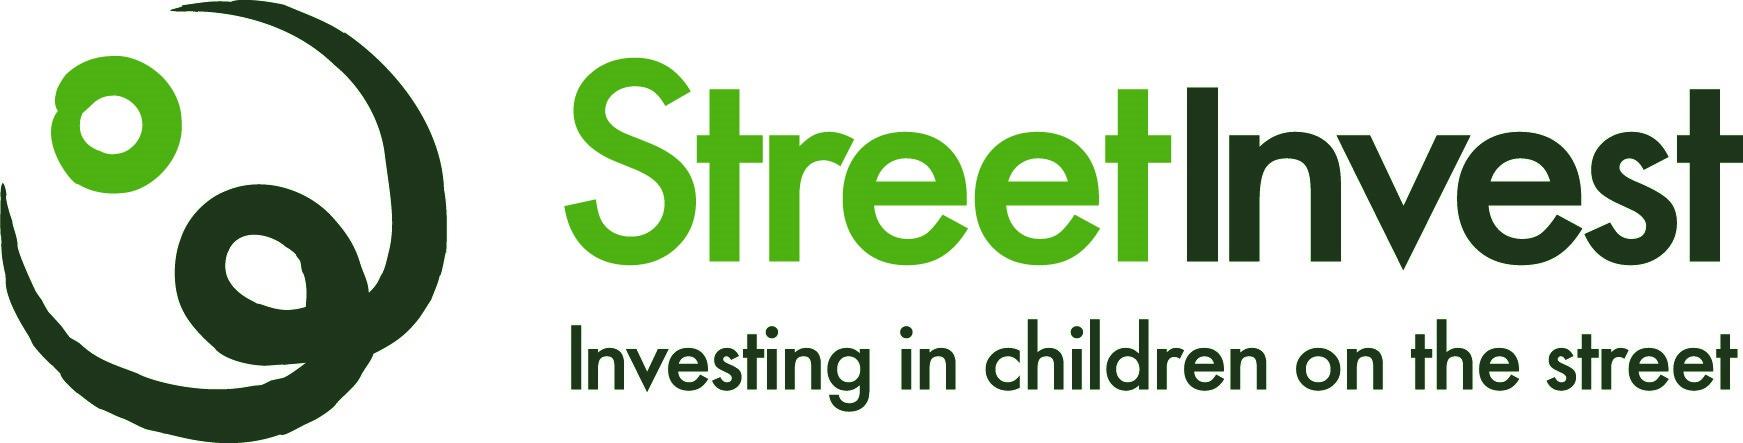 StreetInvest-logo.jpg